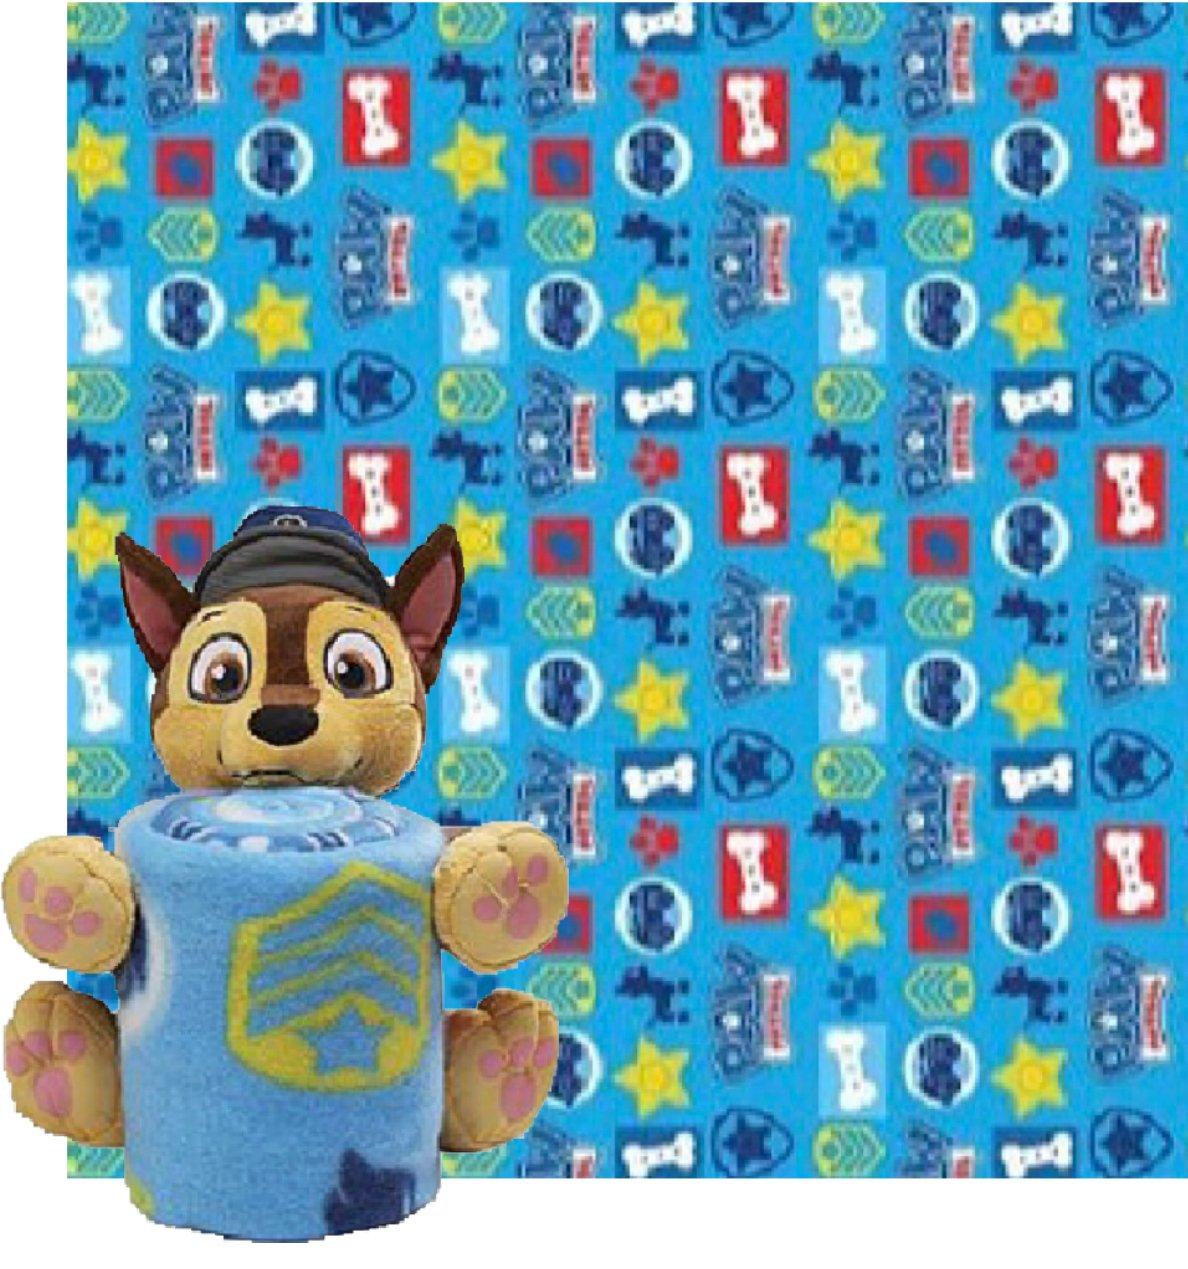 Paw Patrol Fleece Throw Blanket & Chase Cuddle Plush Toy - Kids